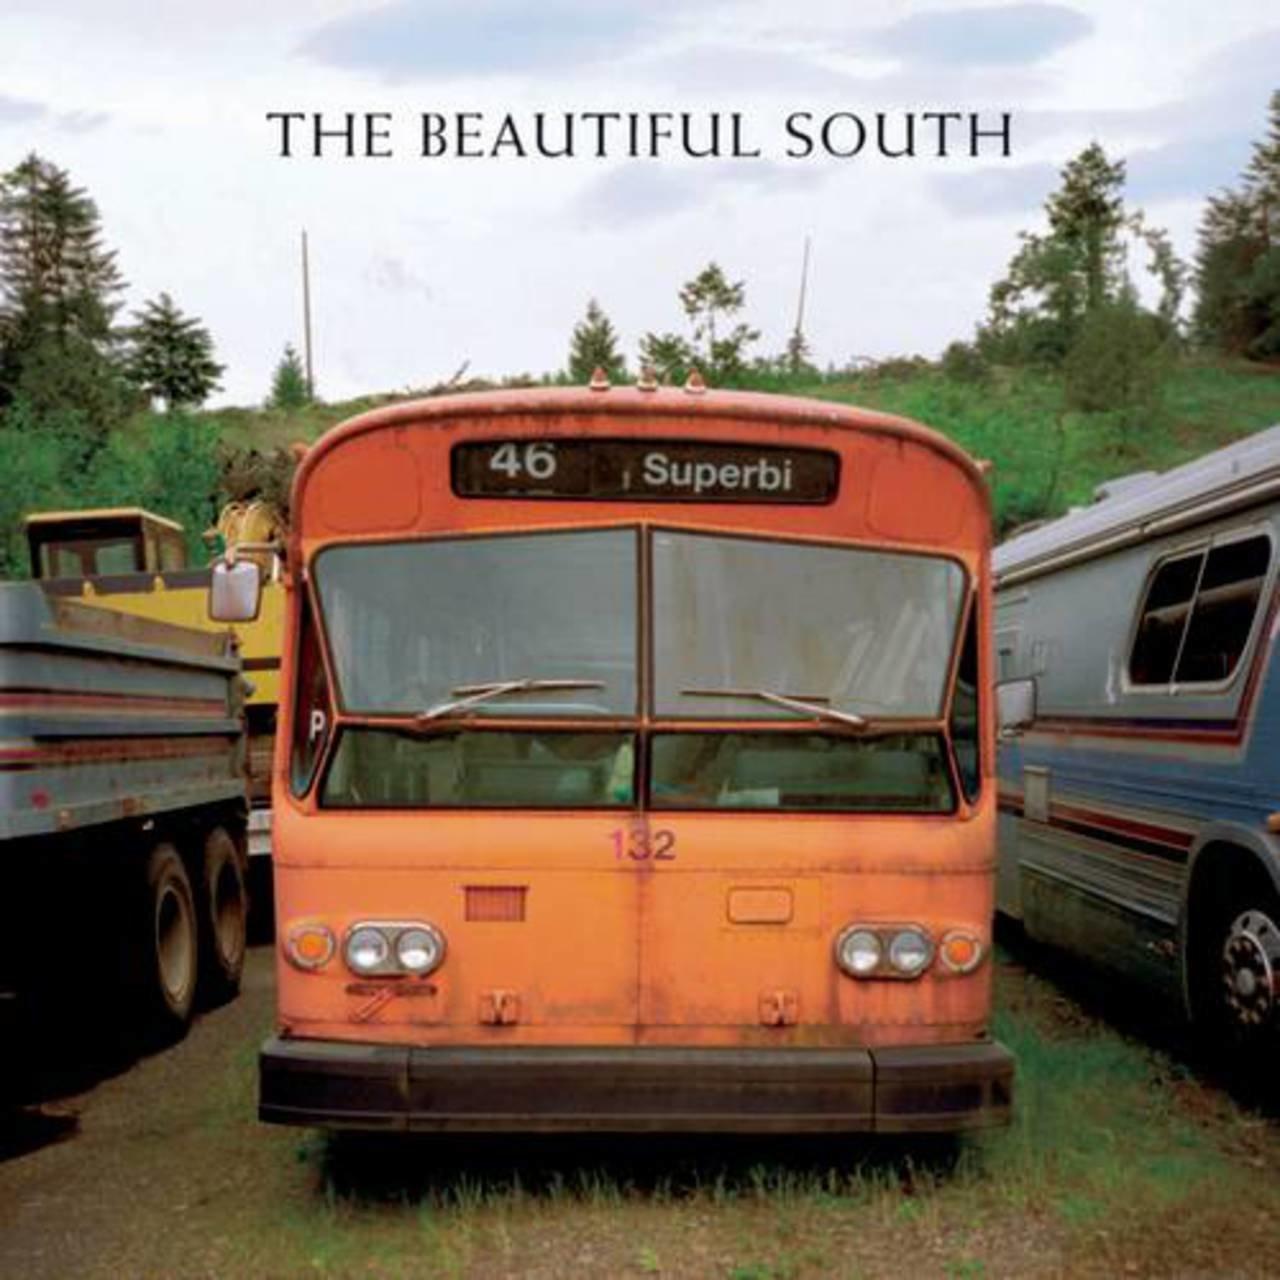 The beautiful south - Engineer